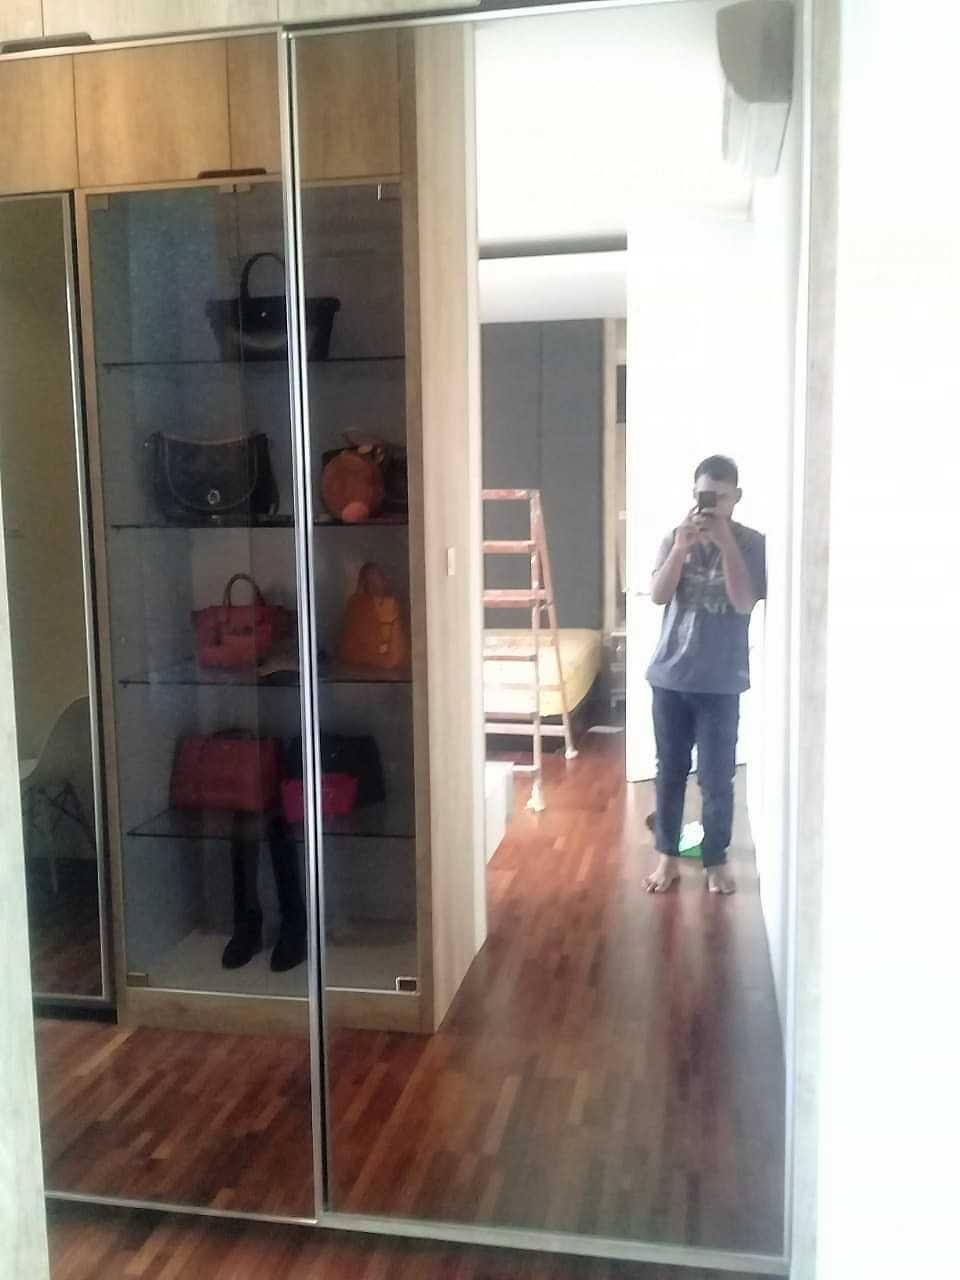 Aditya Wira Hardi Modern Master Bedroom, Medokan Surabaya Surabaya, Kota Sby, Jawa Timur, Indonesia Surabaya, Kota Sby, Jawa Timur, Indonesia Aditya-Wira-Hardi-Modern-Master-Bedroom-Medokan-Surabaya   65952